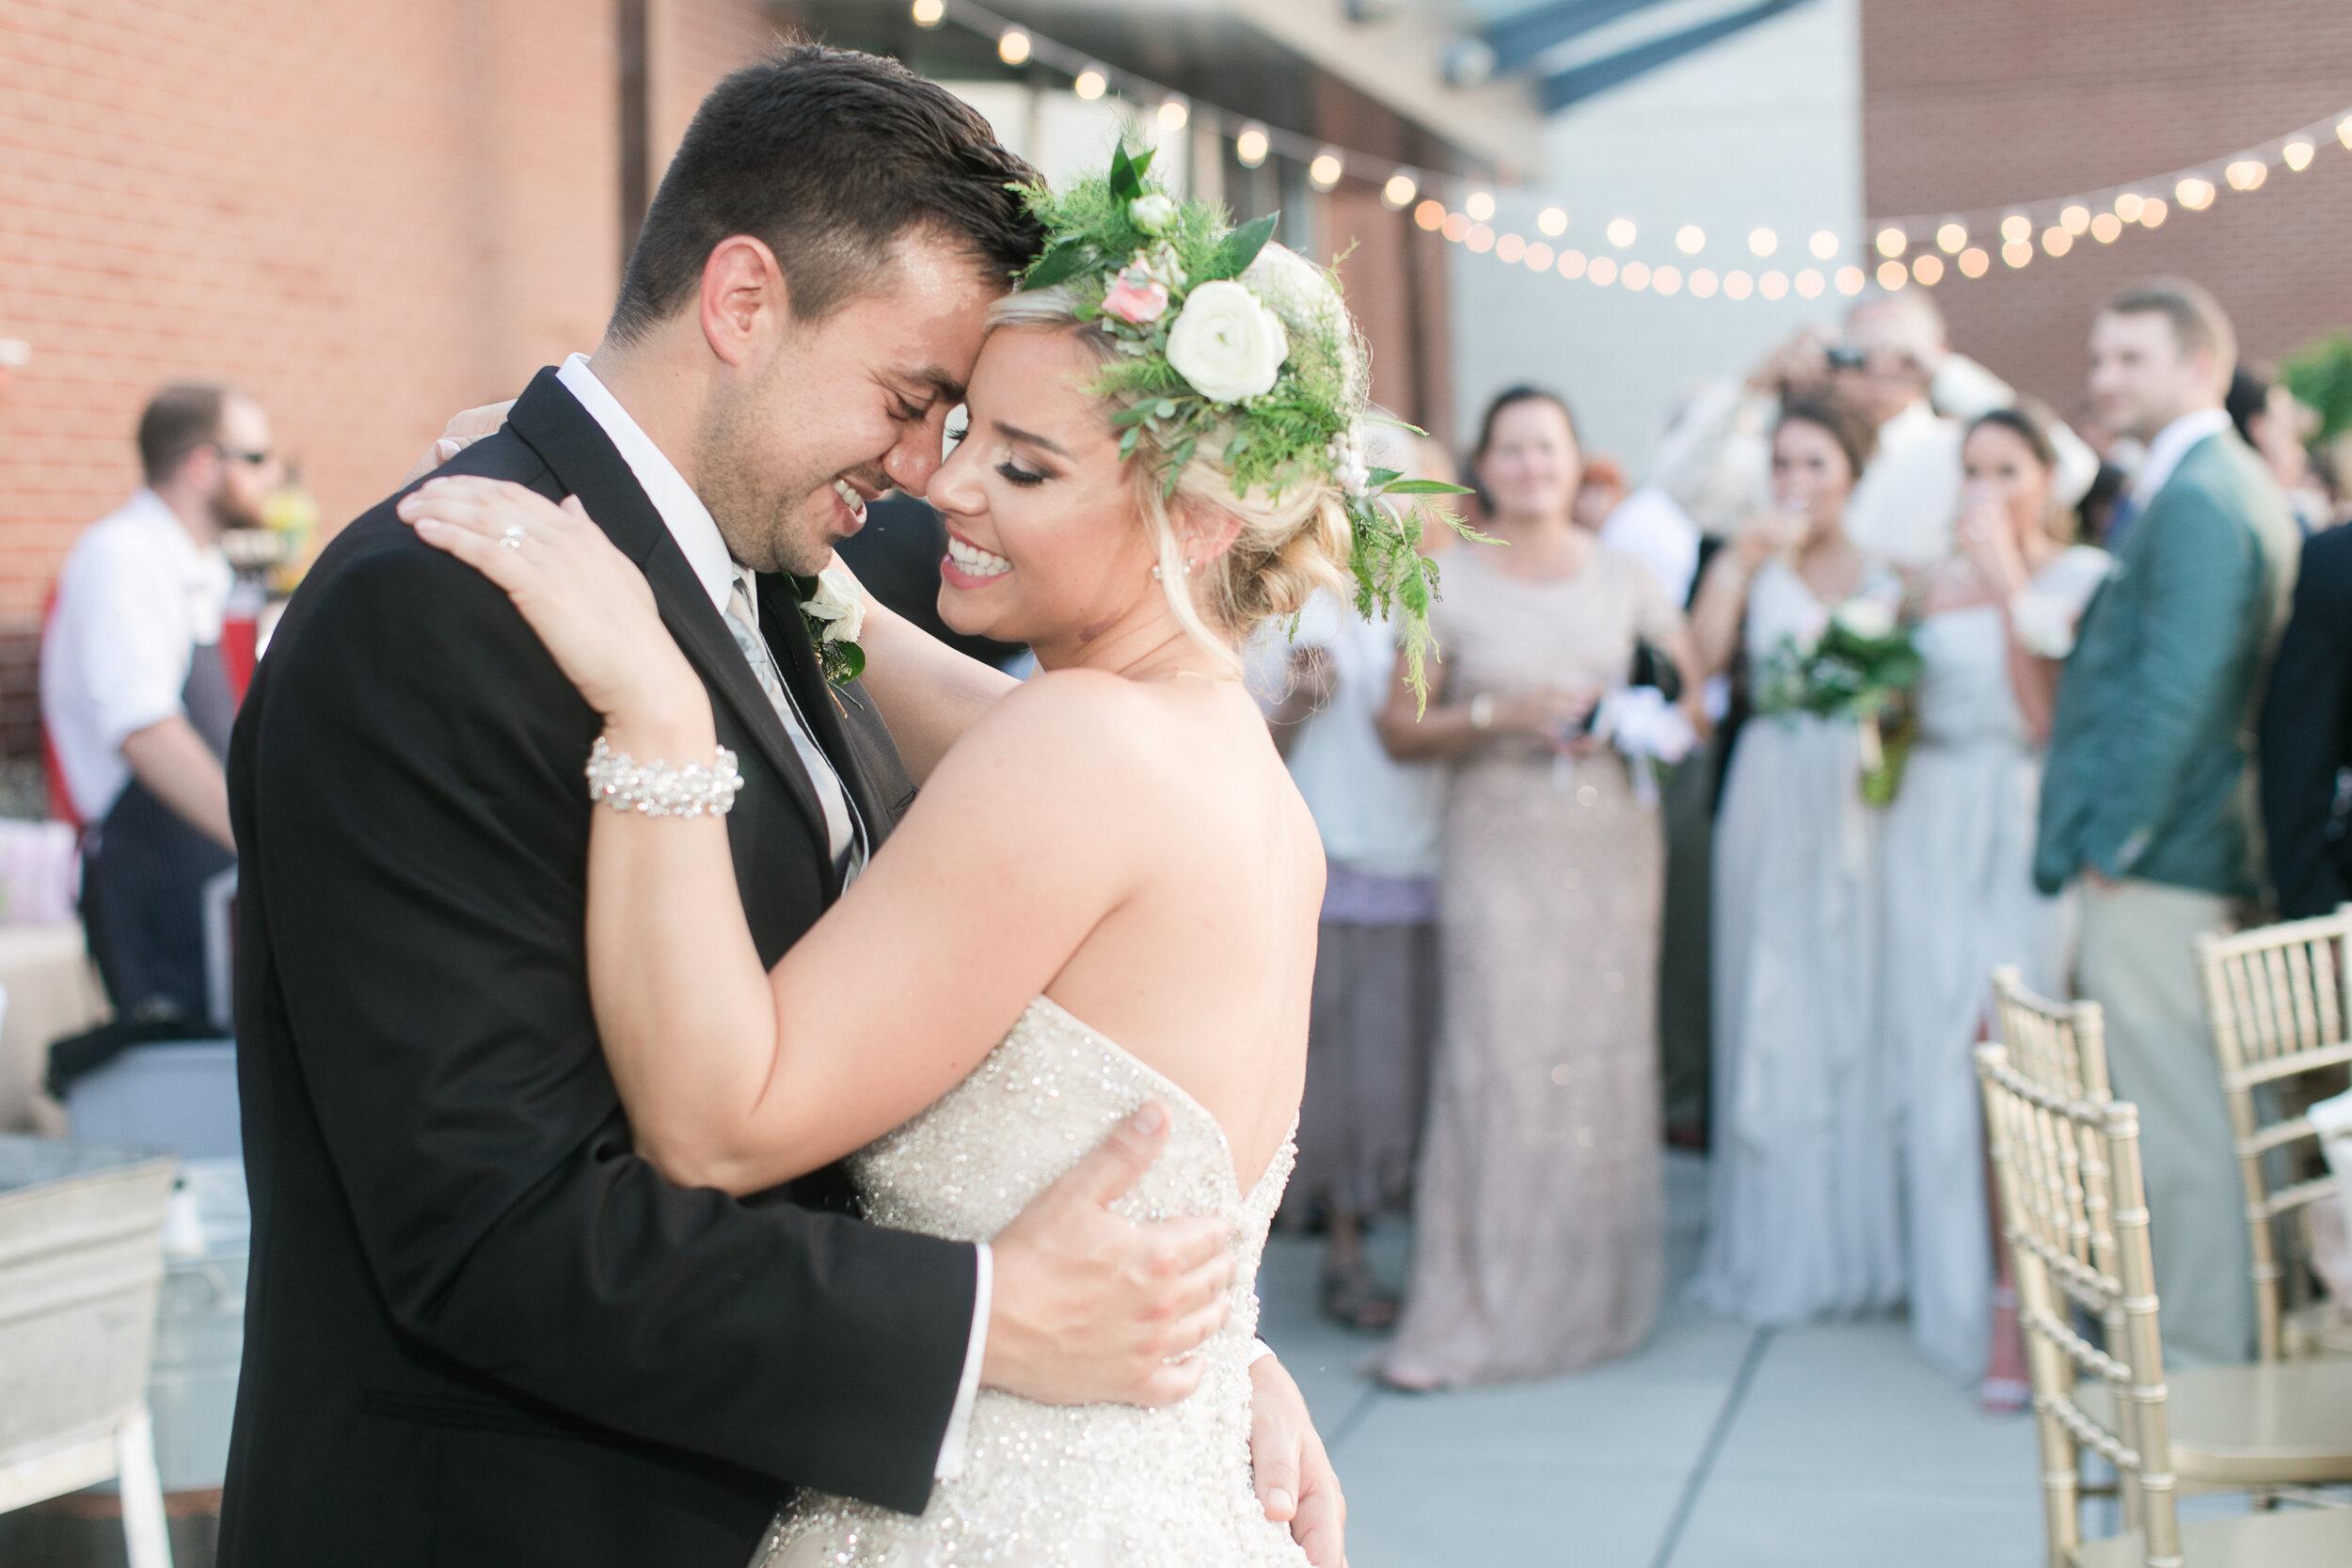 Holly-David-wedding-588.jpg